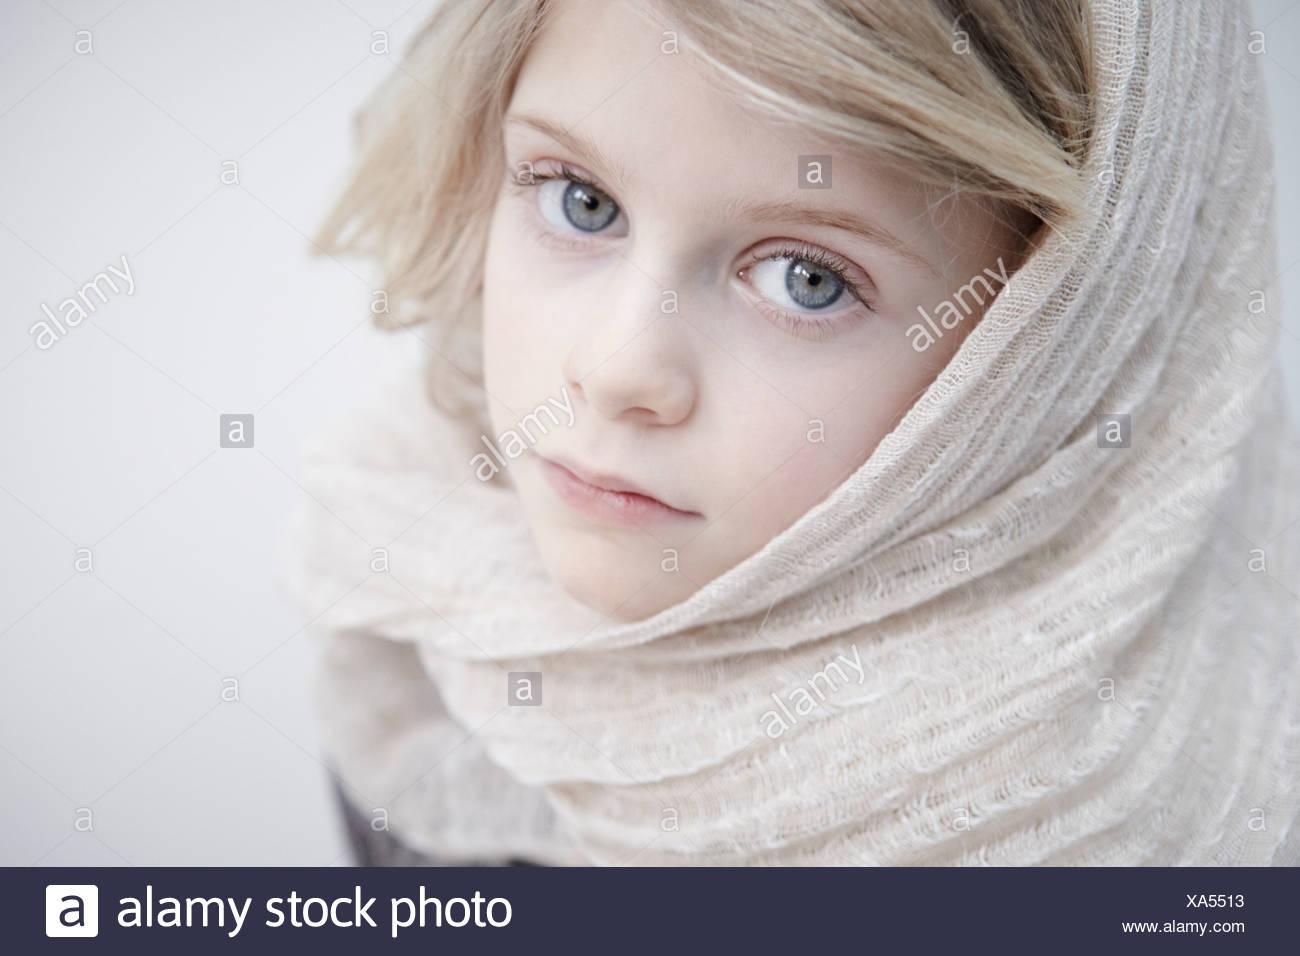 Portrait of girl wearing headscarf - Stock Image